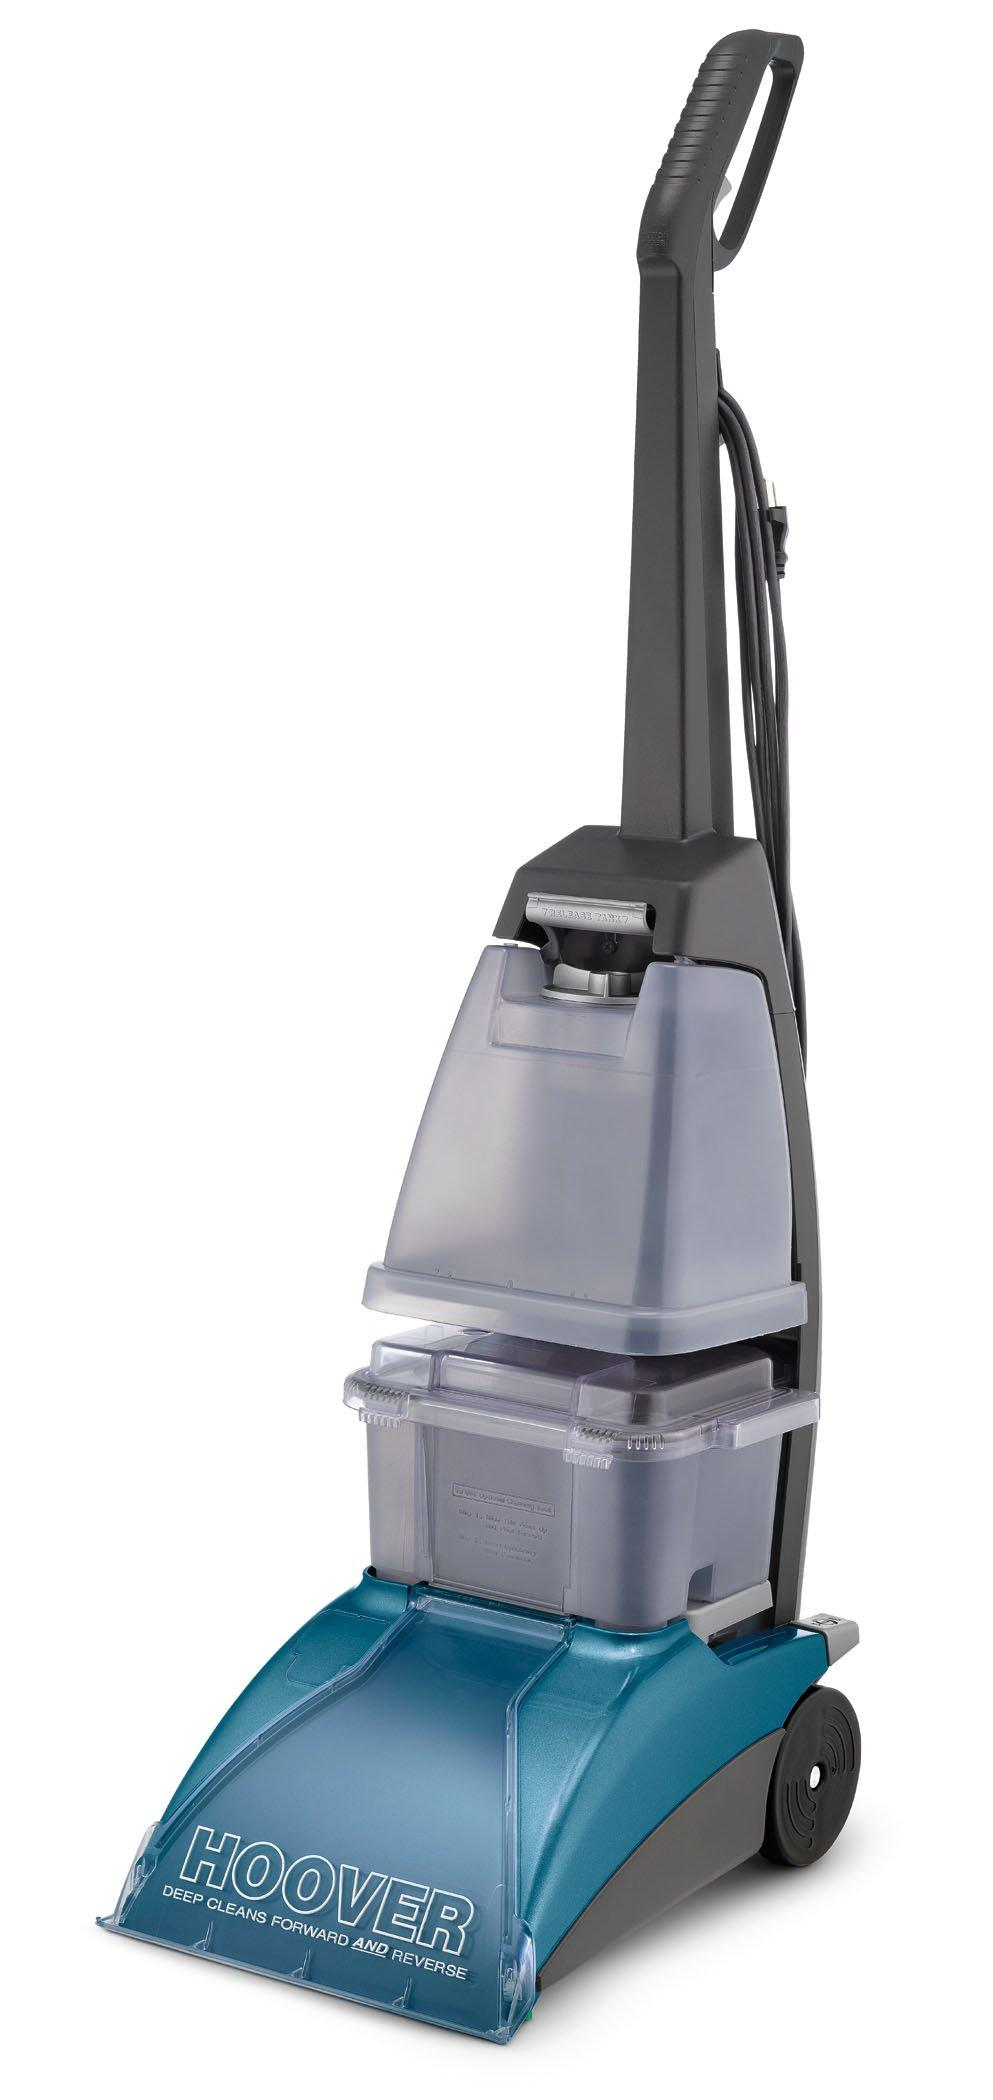 SteamVac Carpet Cleaner2